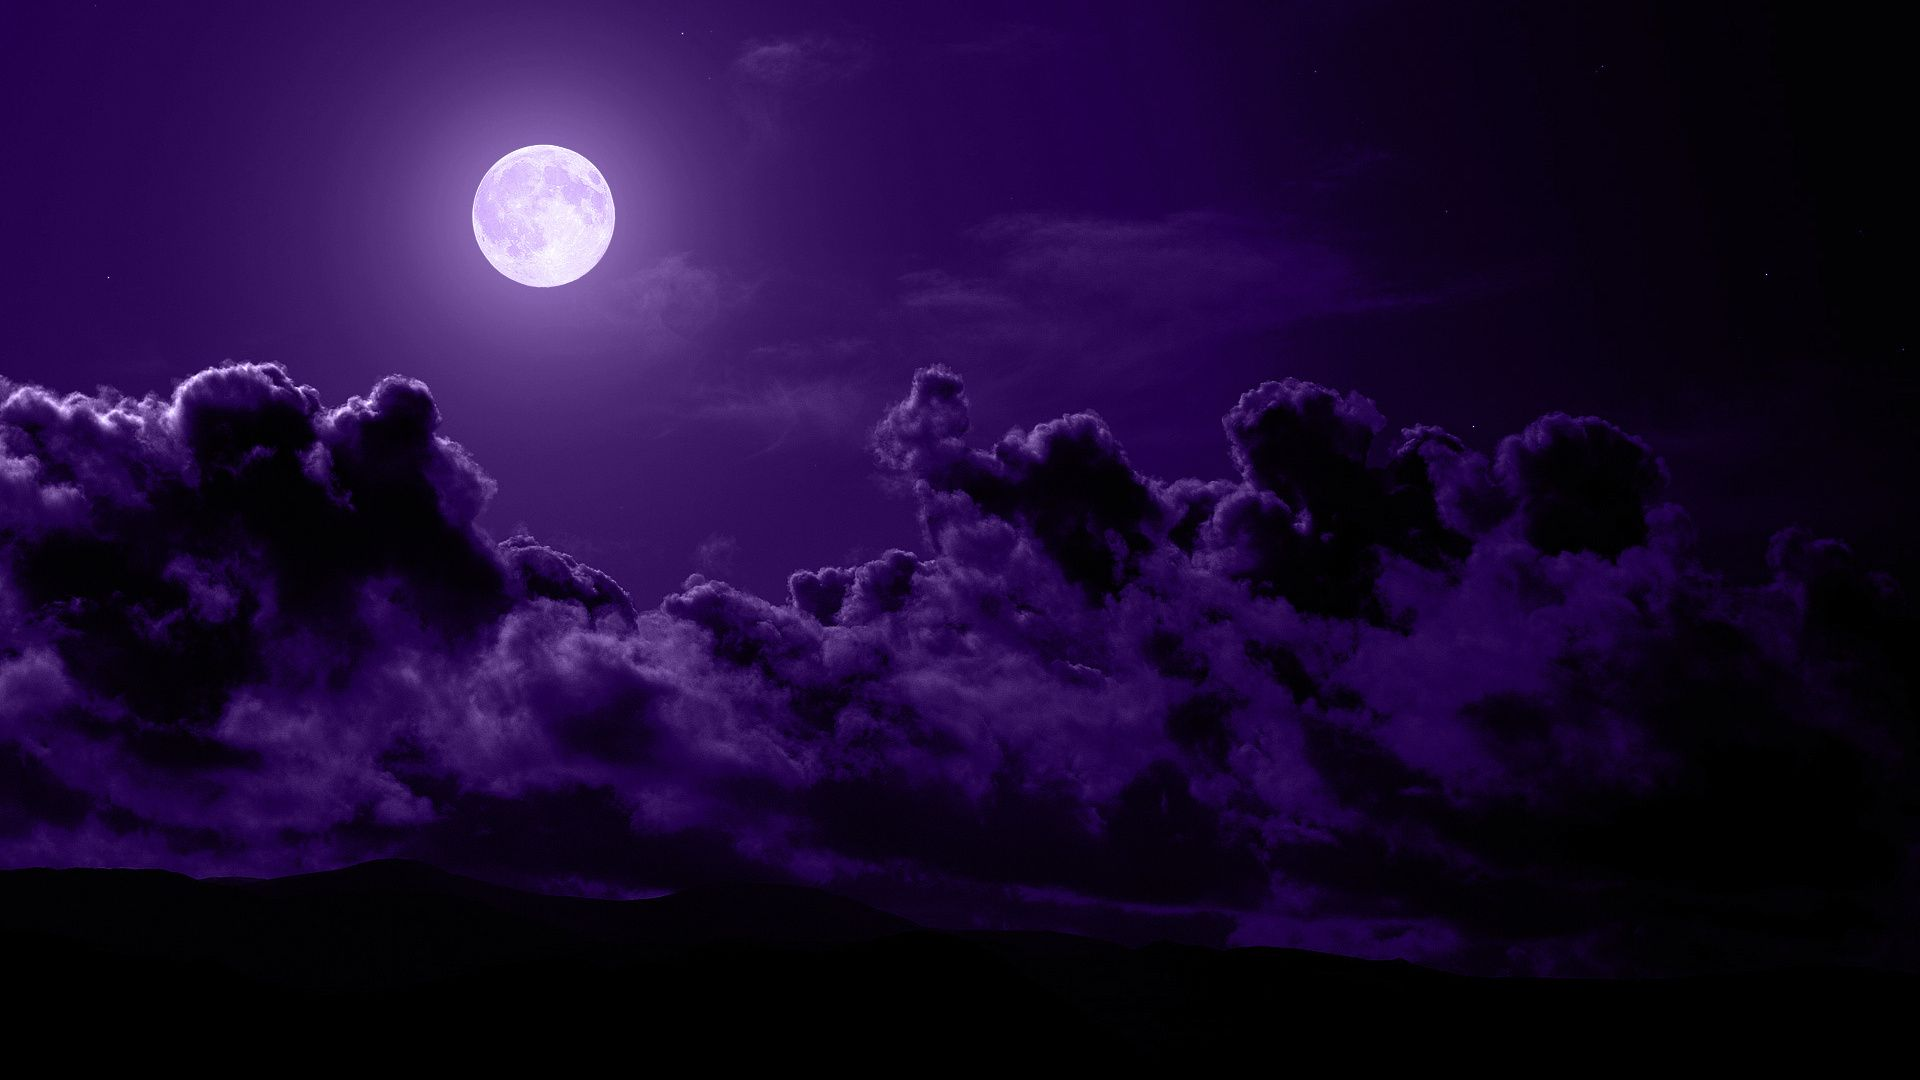 Dark Purple Aesthetic Laptop Wallpapers Top Free Dark Purple Aesthetic Laptop Backgrounds Wallpaperaccess